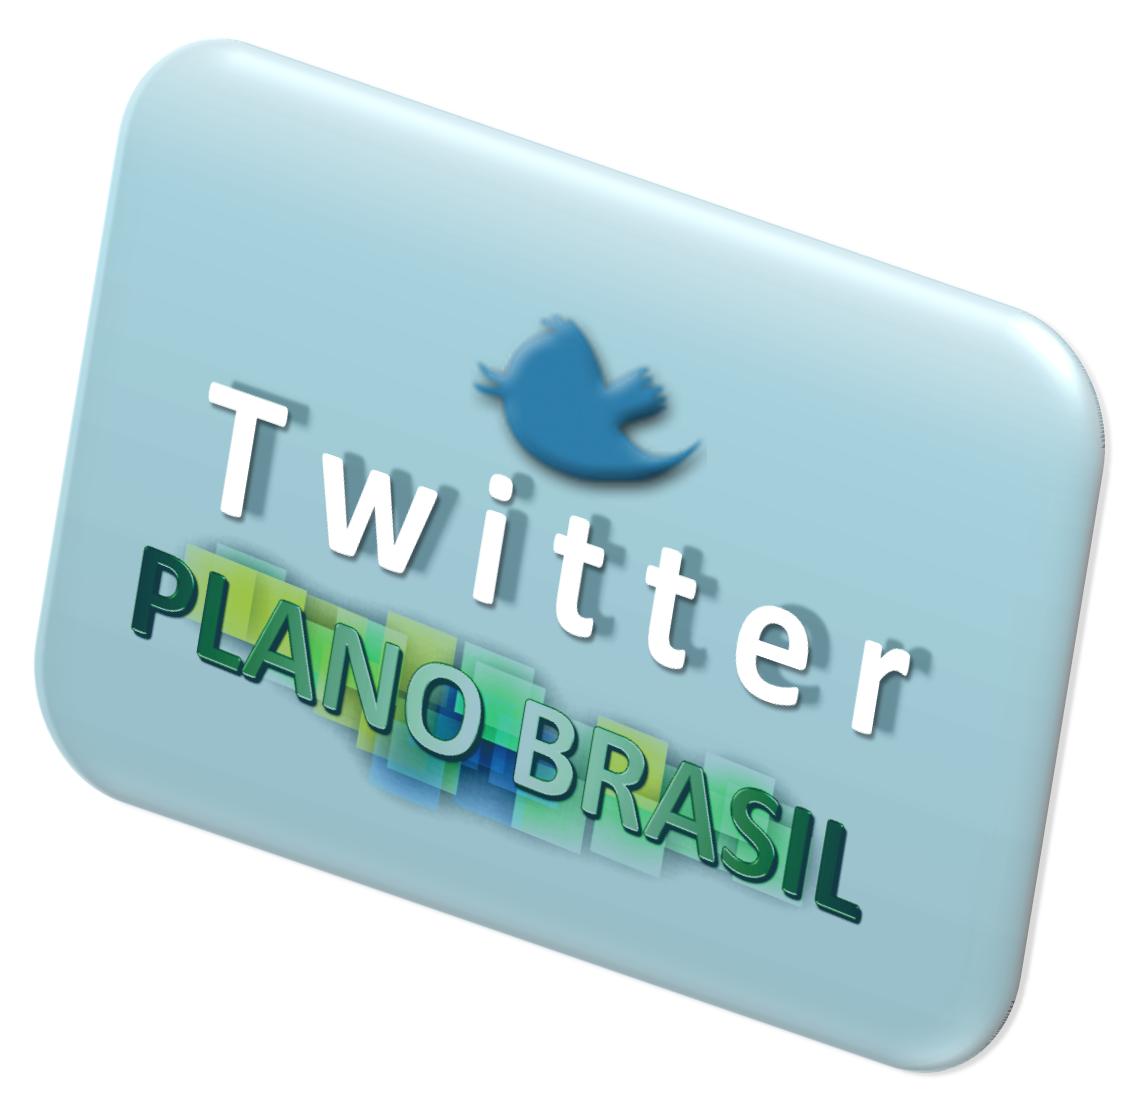 Dica: Acompanhe o Plano Brasil pelo Twitter e Orkut